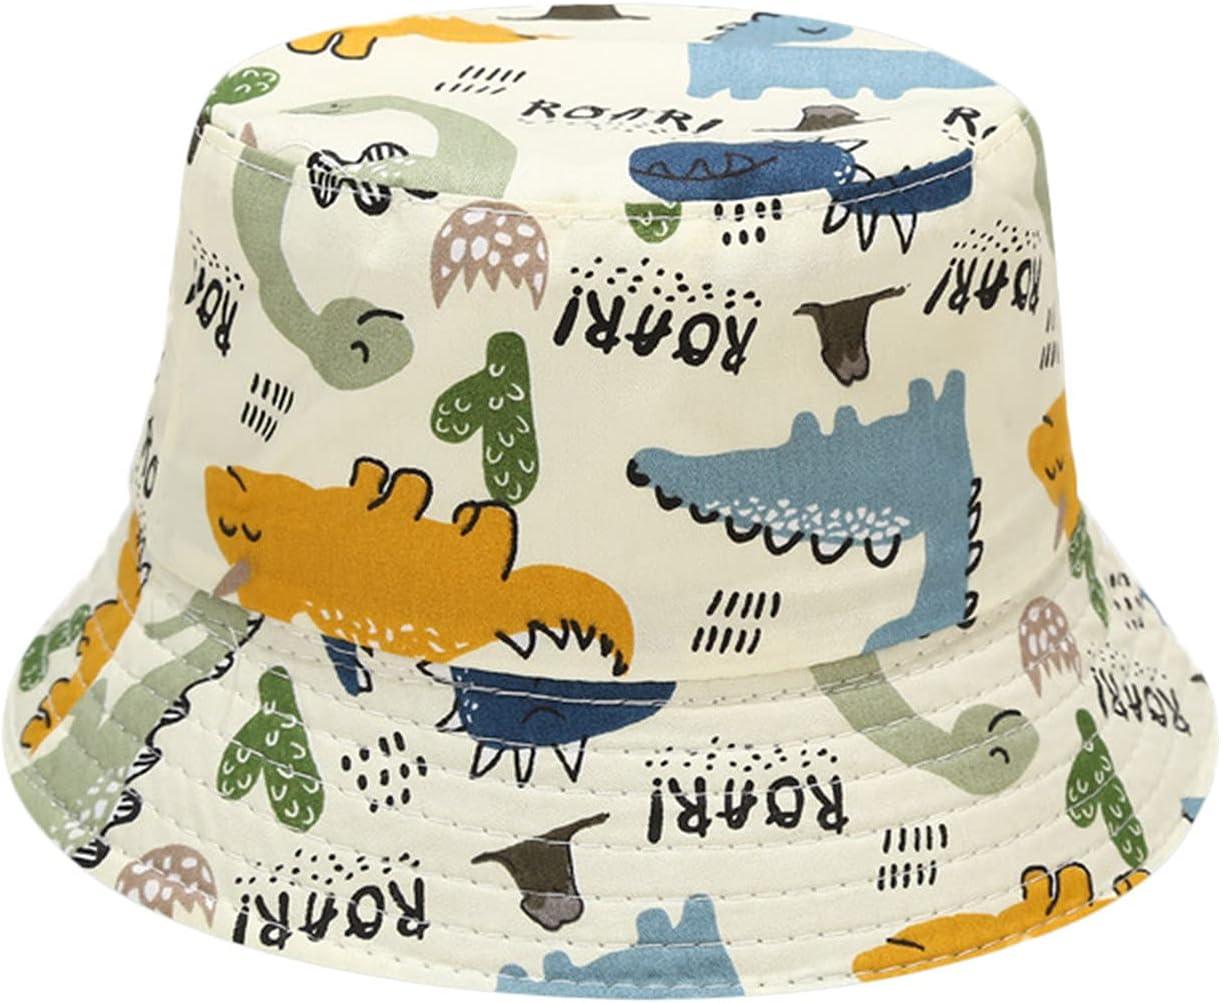 Import uleiqichepeijianyou 1-4 Years Albuquerque Mall Old Baby Hat Cotton Sun Bucket